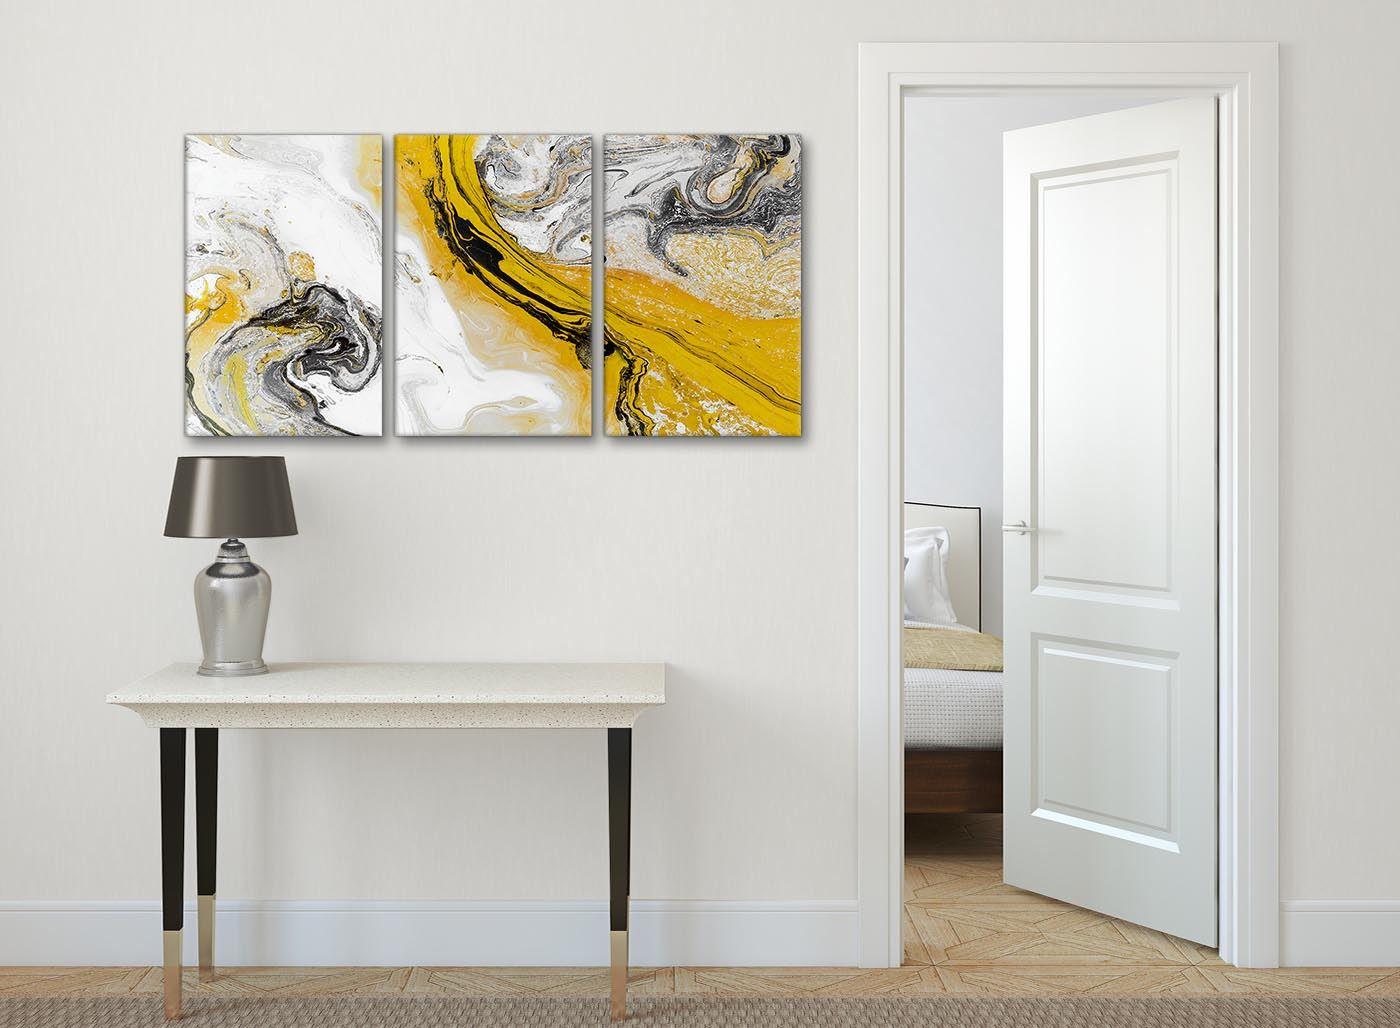 Mustard Yellow And Grey Swirl Bedroom Canvas Wall Art Abstract Print Ebay